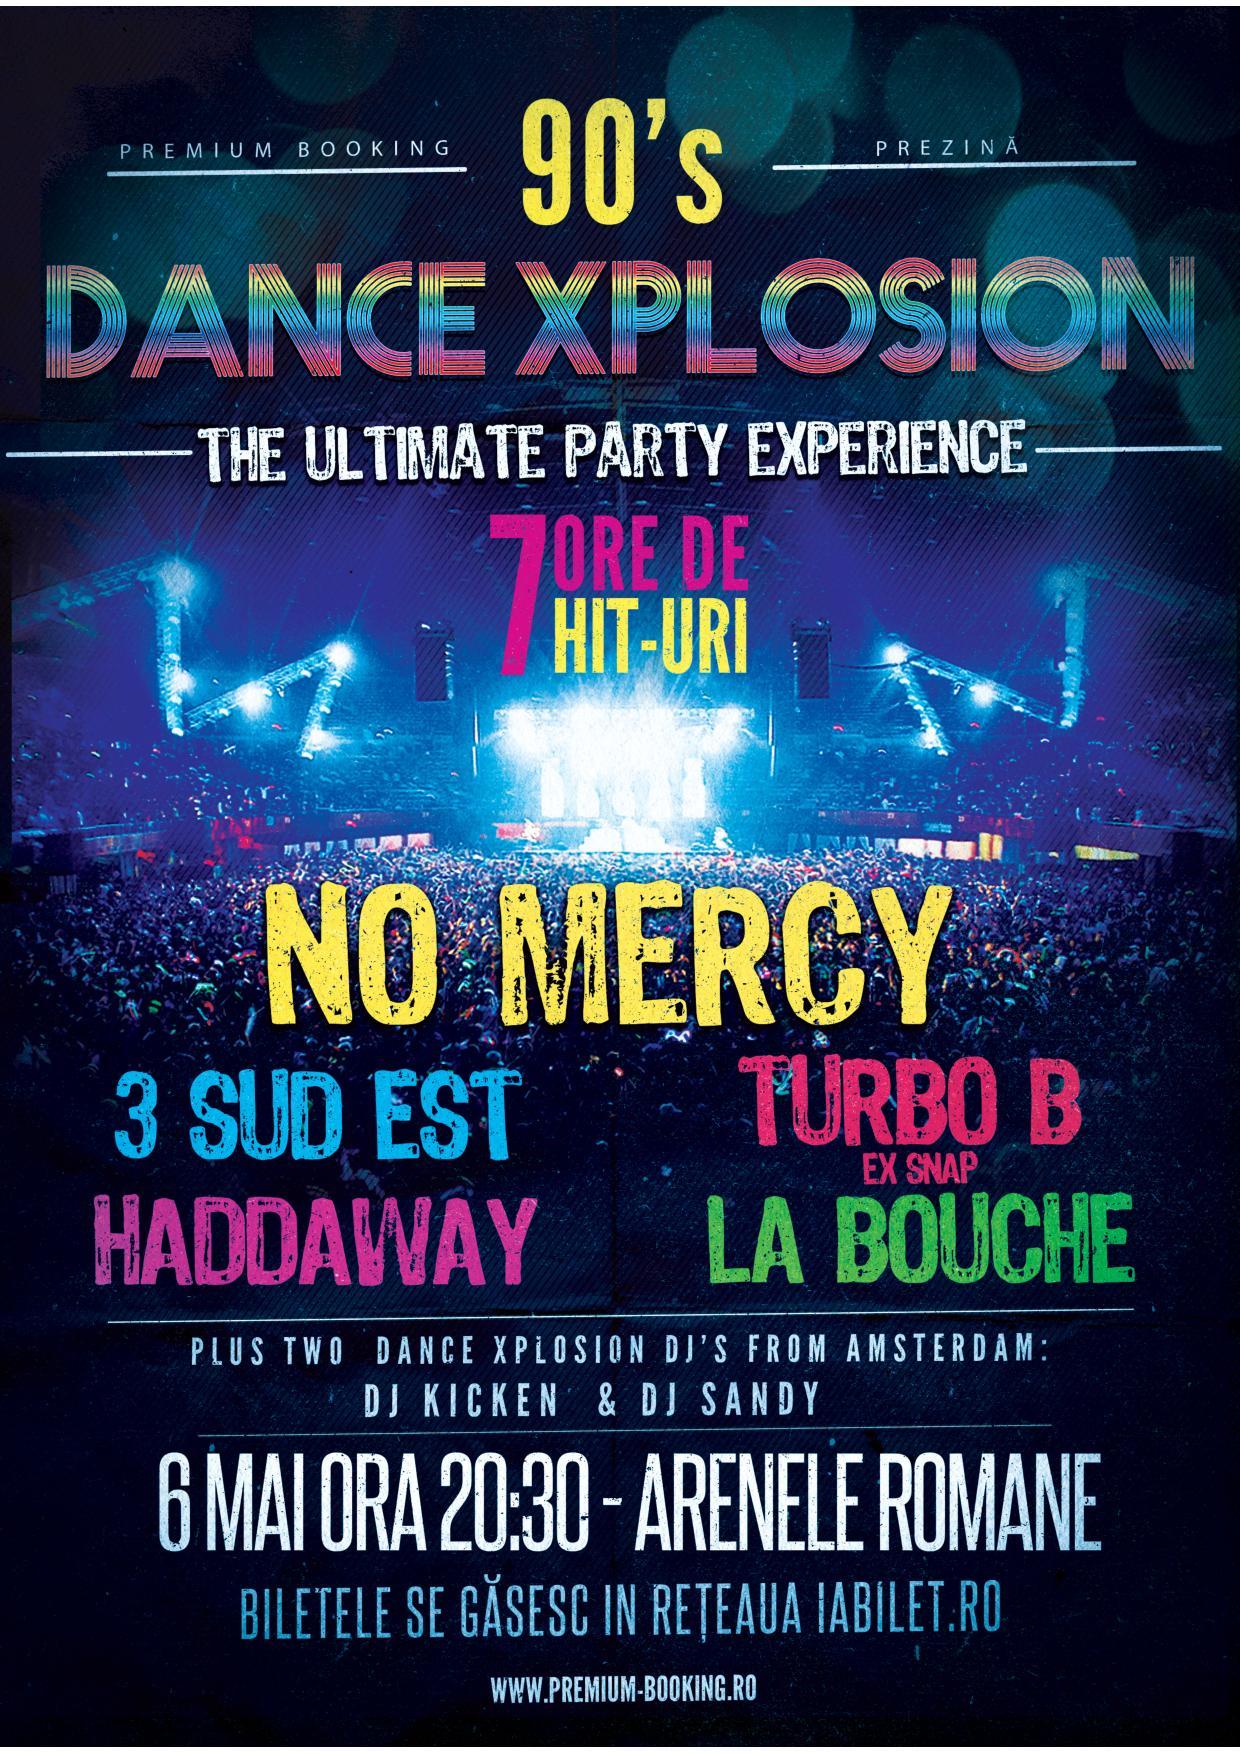 90'S DANCE XPLOSION LIVE, la Bucuresti! Artistii care au definit muzica anilor '90, NO MERCY, TURBO B( ex-SNAP!), HADDAWAY, LA BOUCHE  si 3 SUD EST, in concert la ARENELE ROMANE